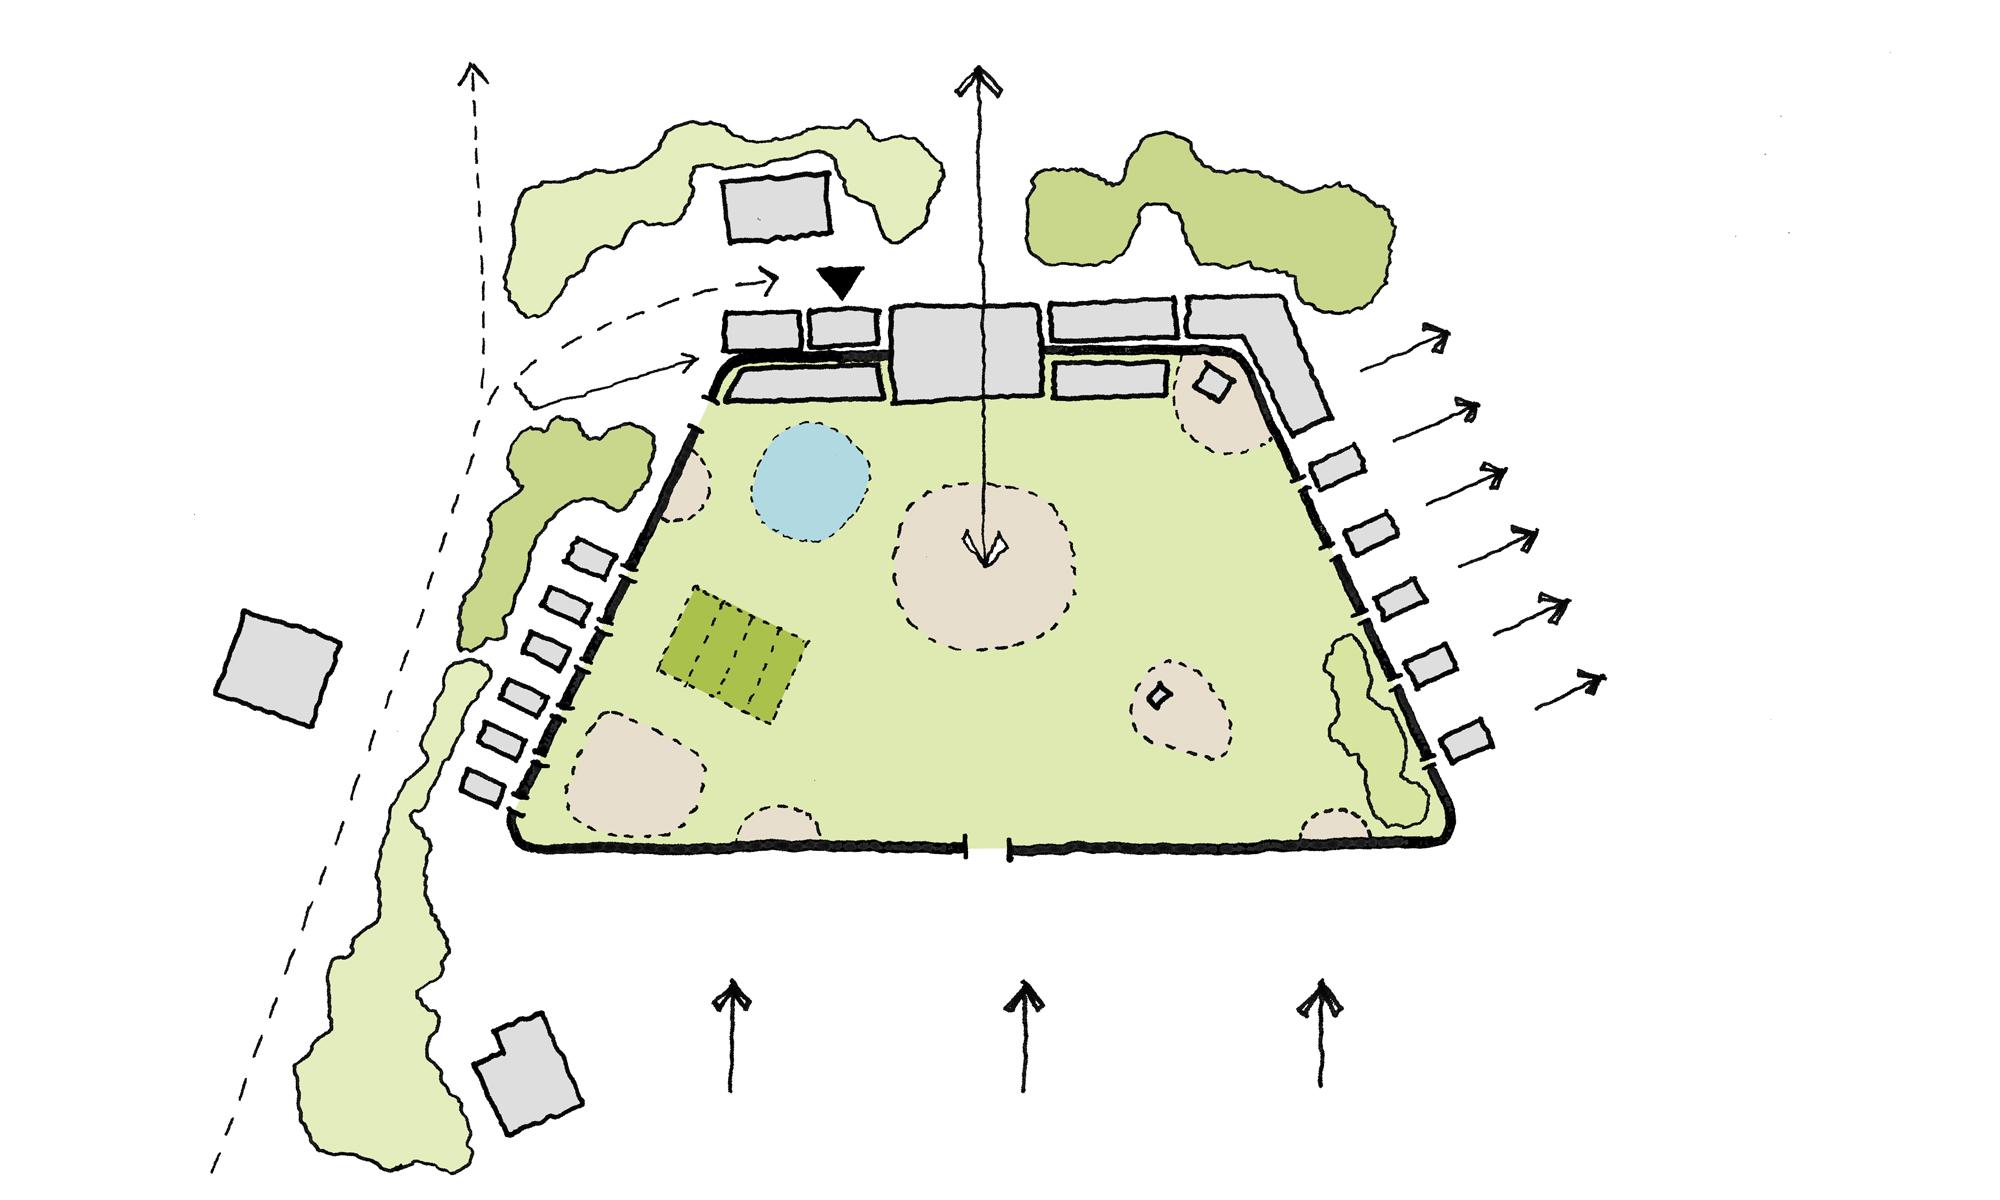 Hesleyside Walled Garden Sketch